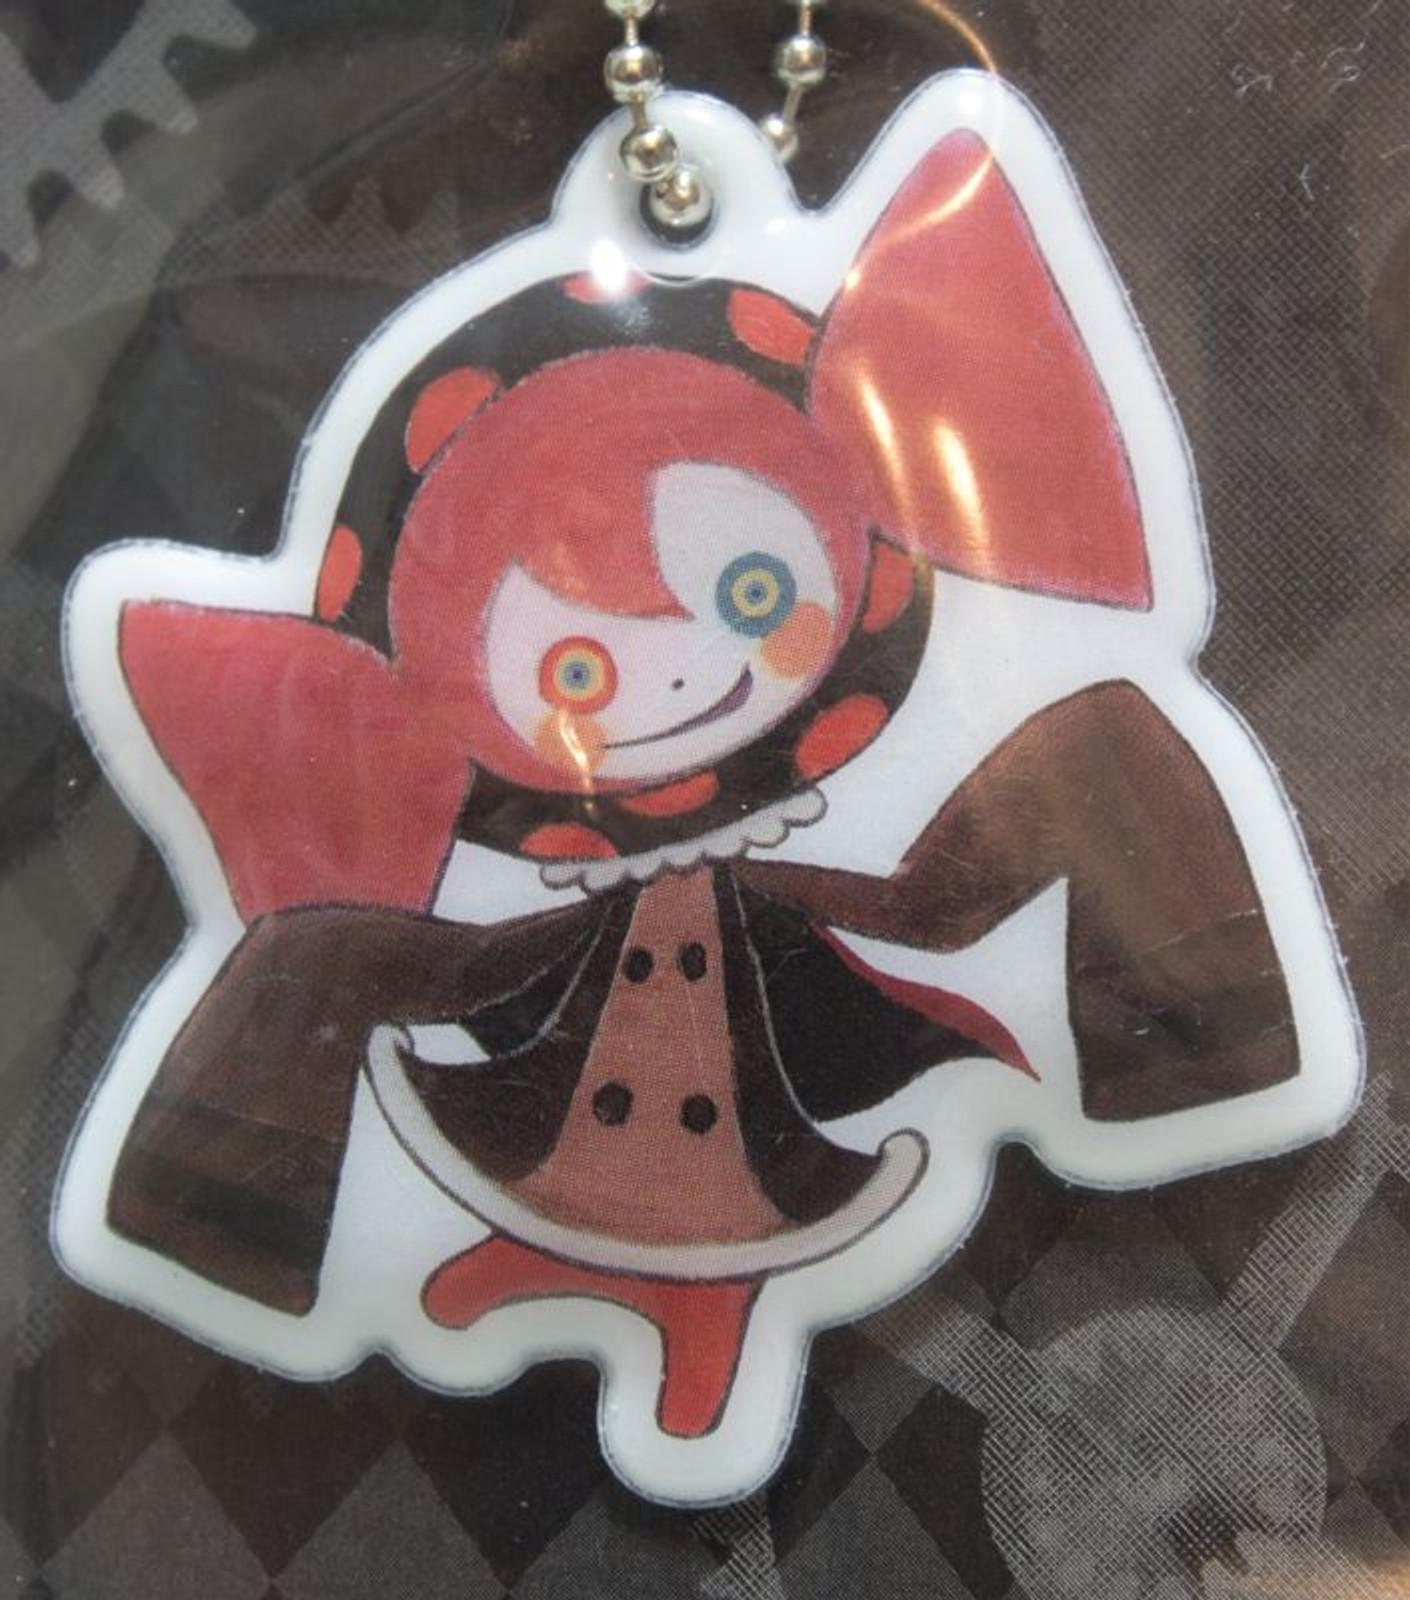 Puella Magi Madoka Magica Sweet Witch Ball Chain Keyholder Lawson Limited JAPAN